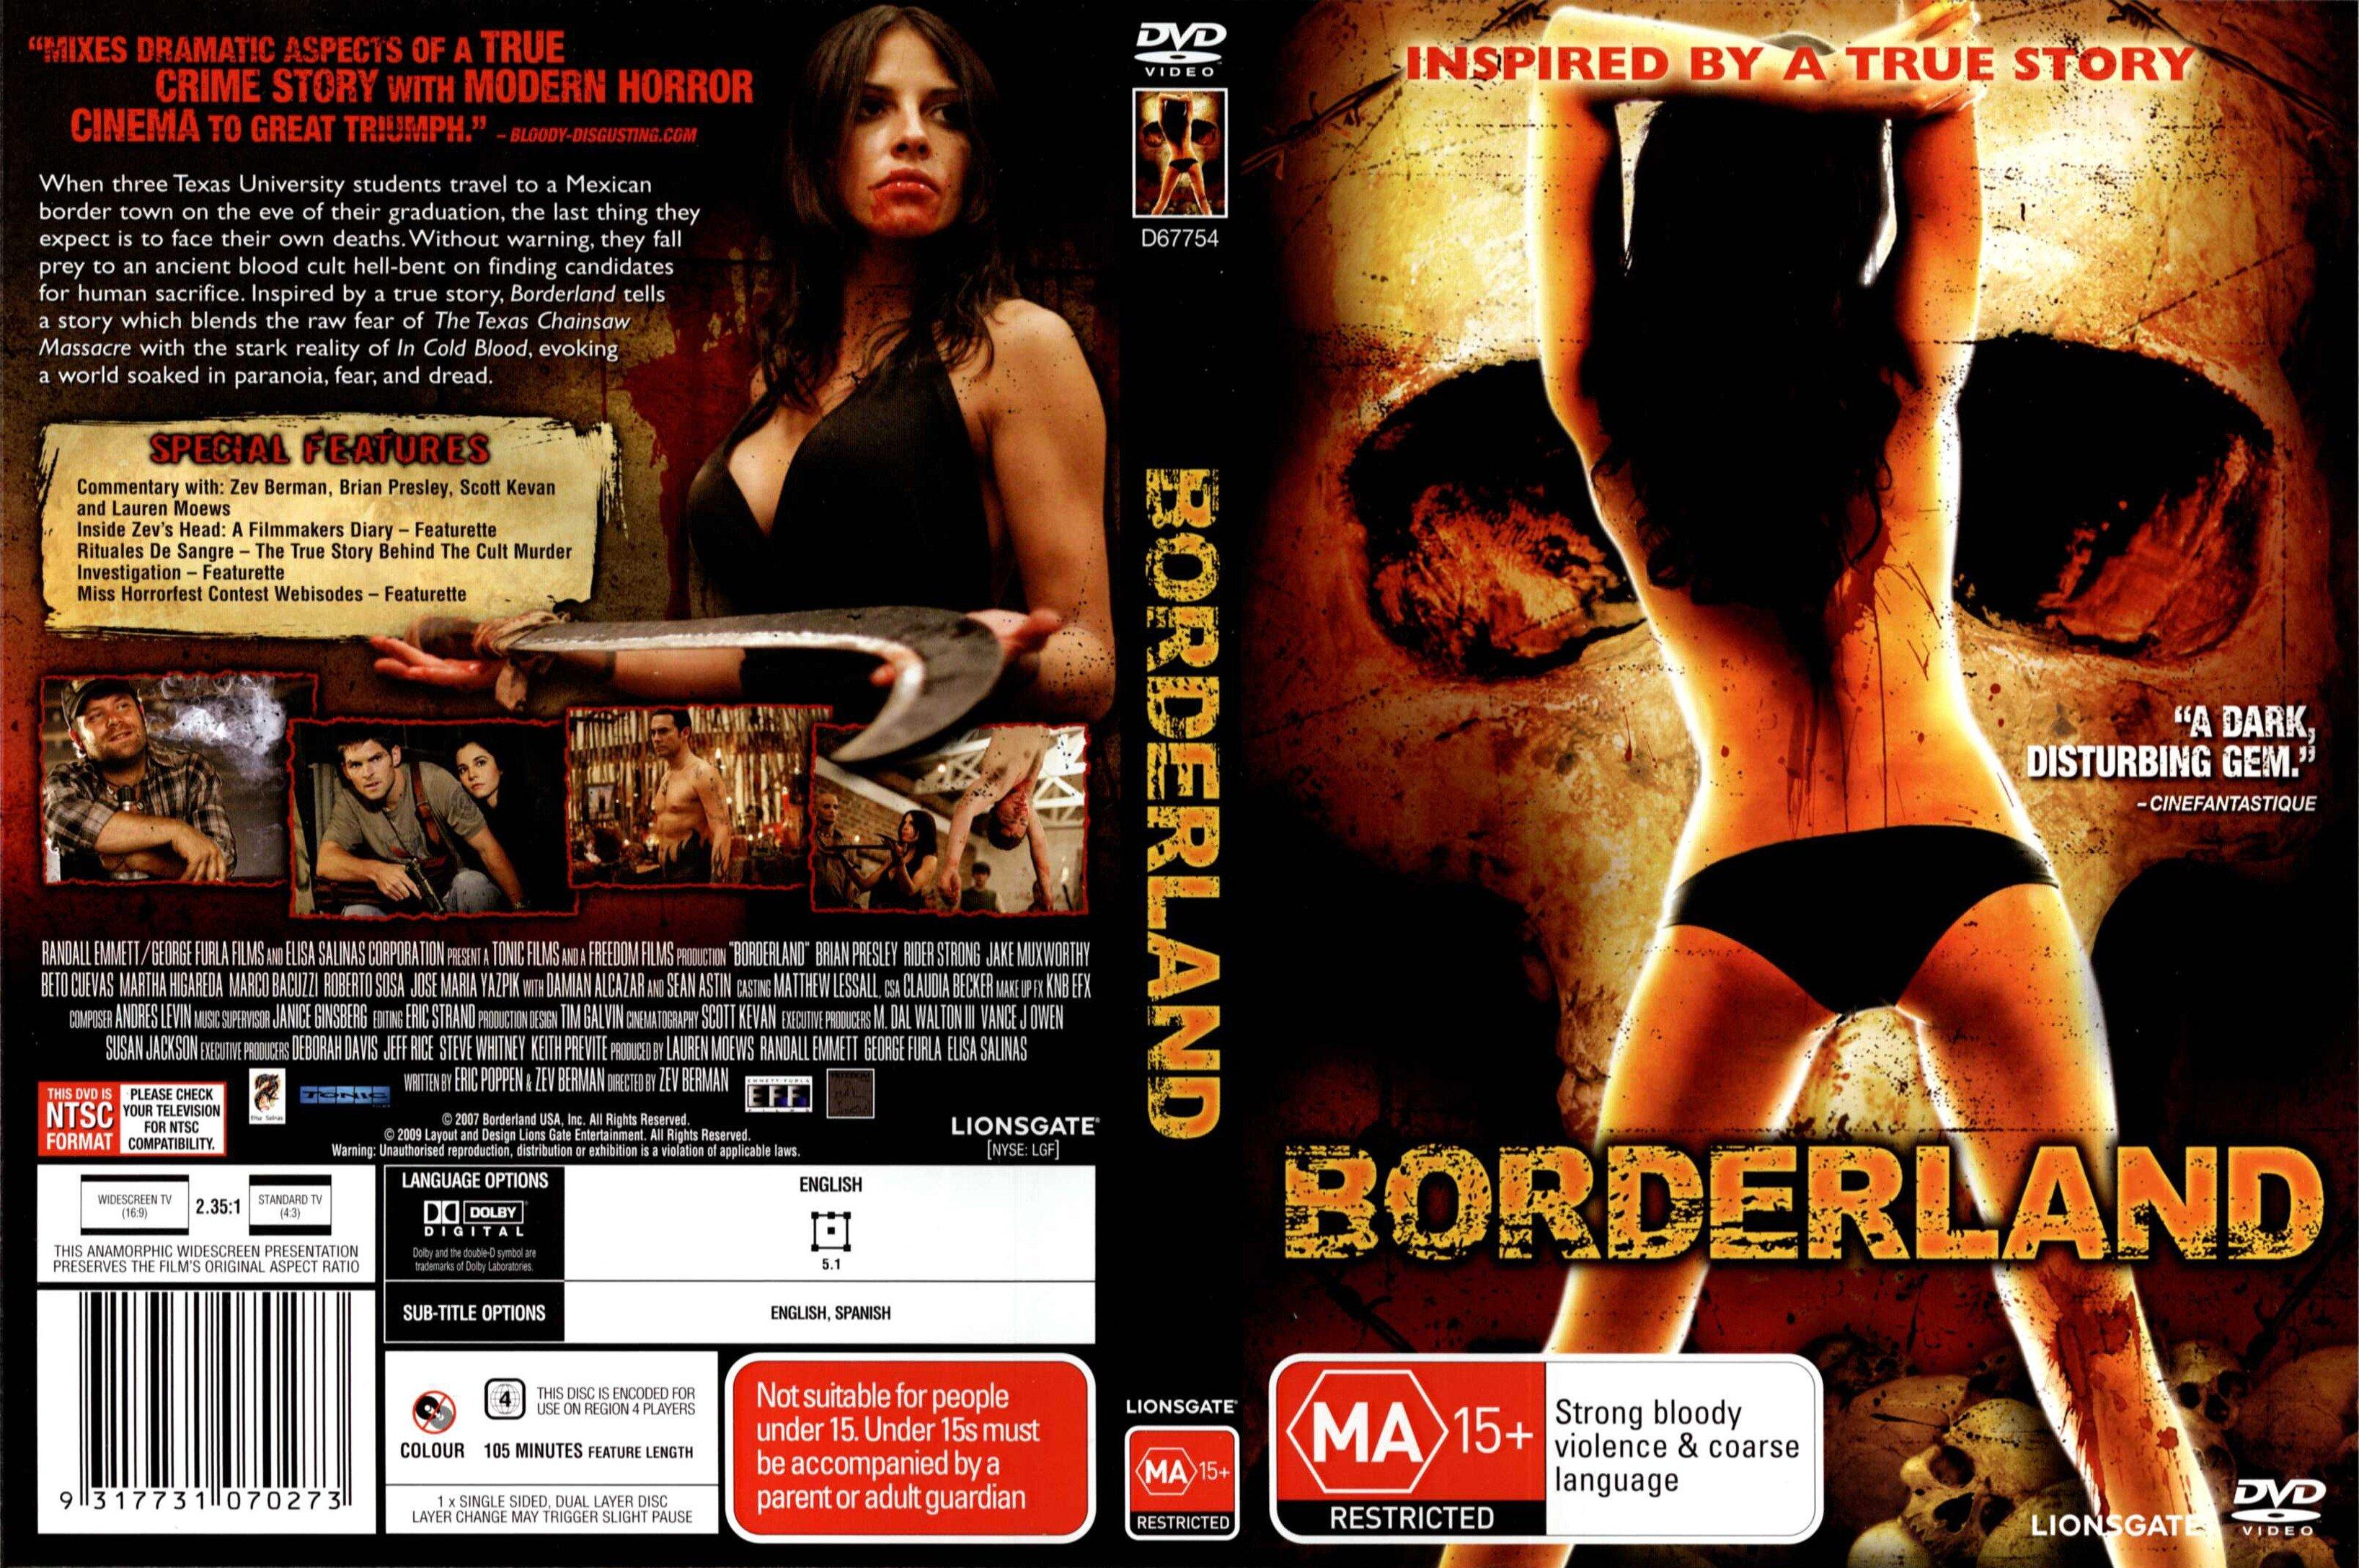 Borderland gebundener voller Film